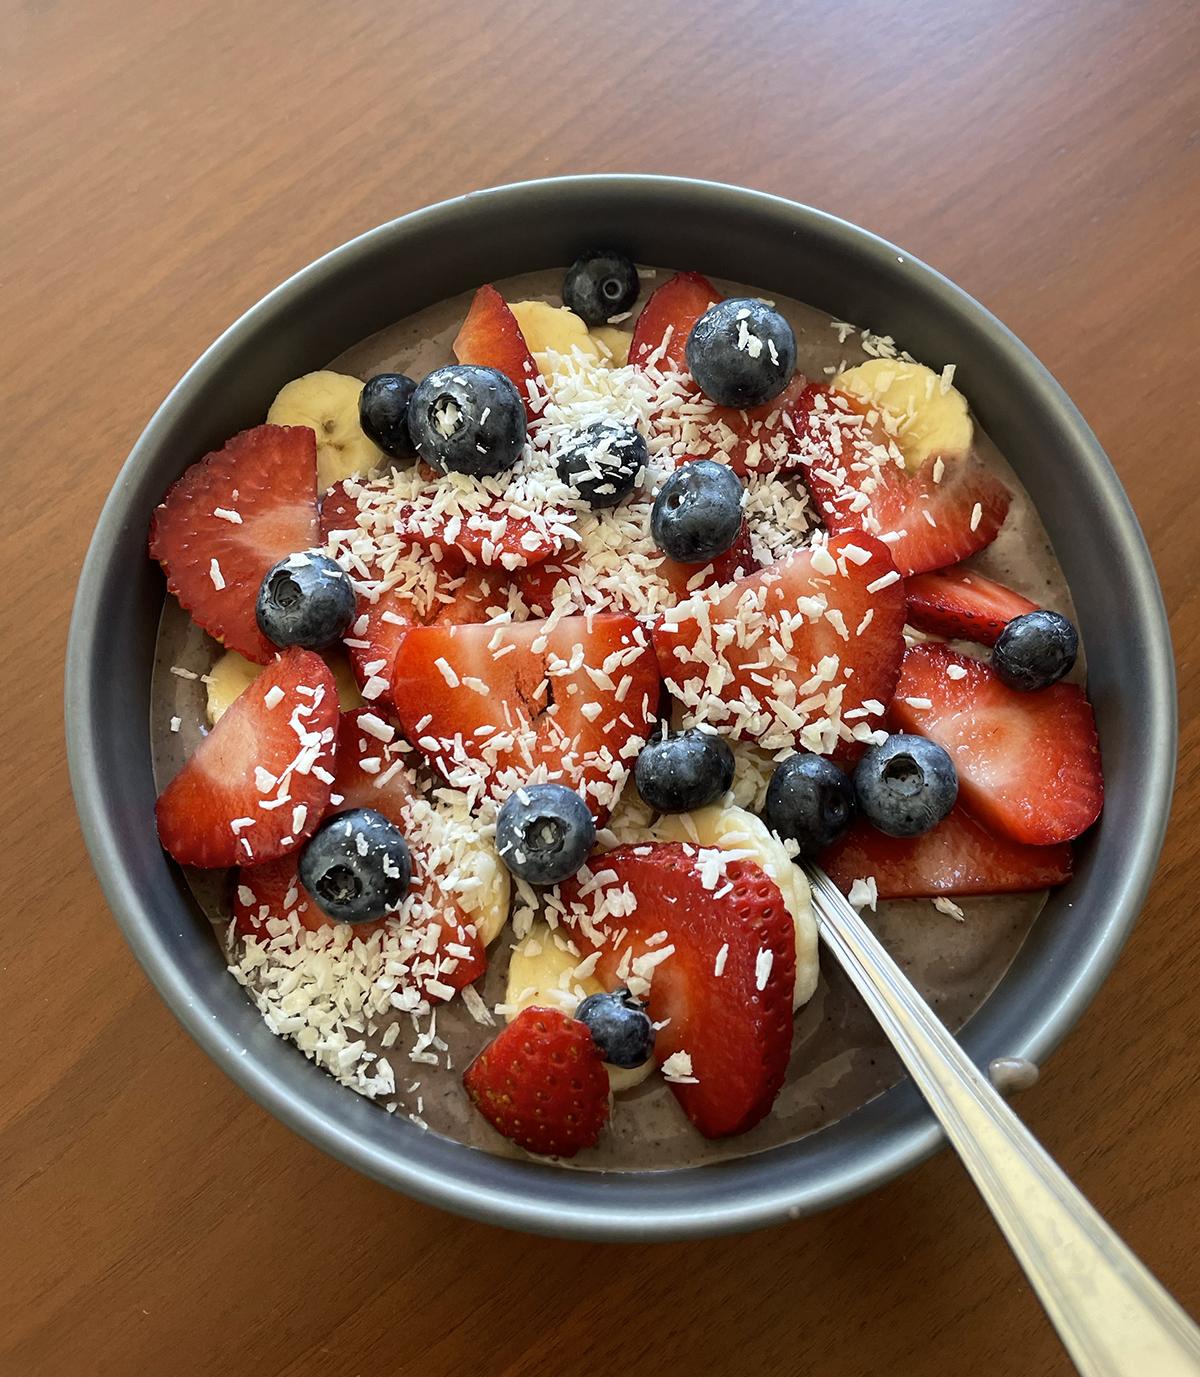 Vegan Acai Bowl Recipe by Anjelica and Ryan